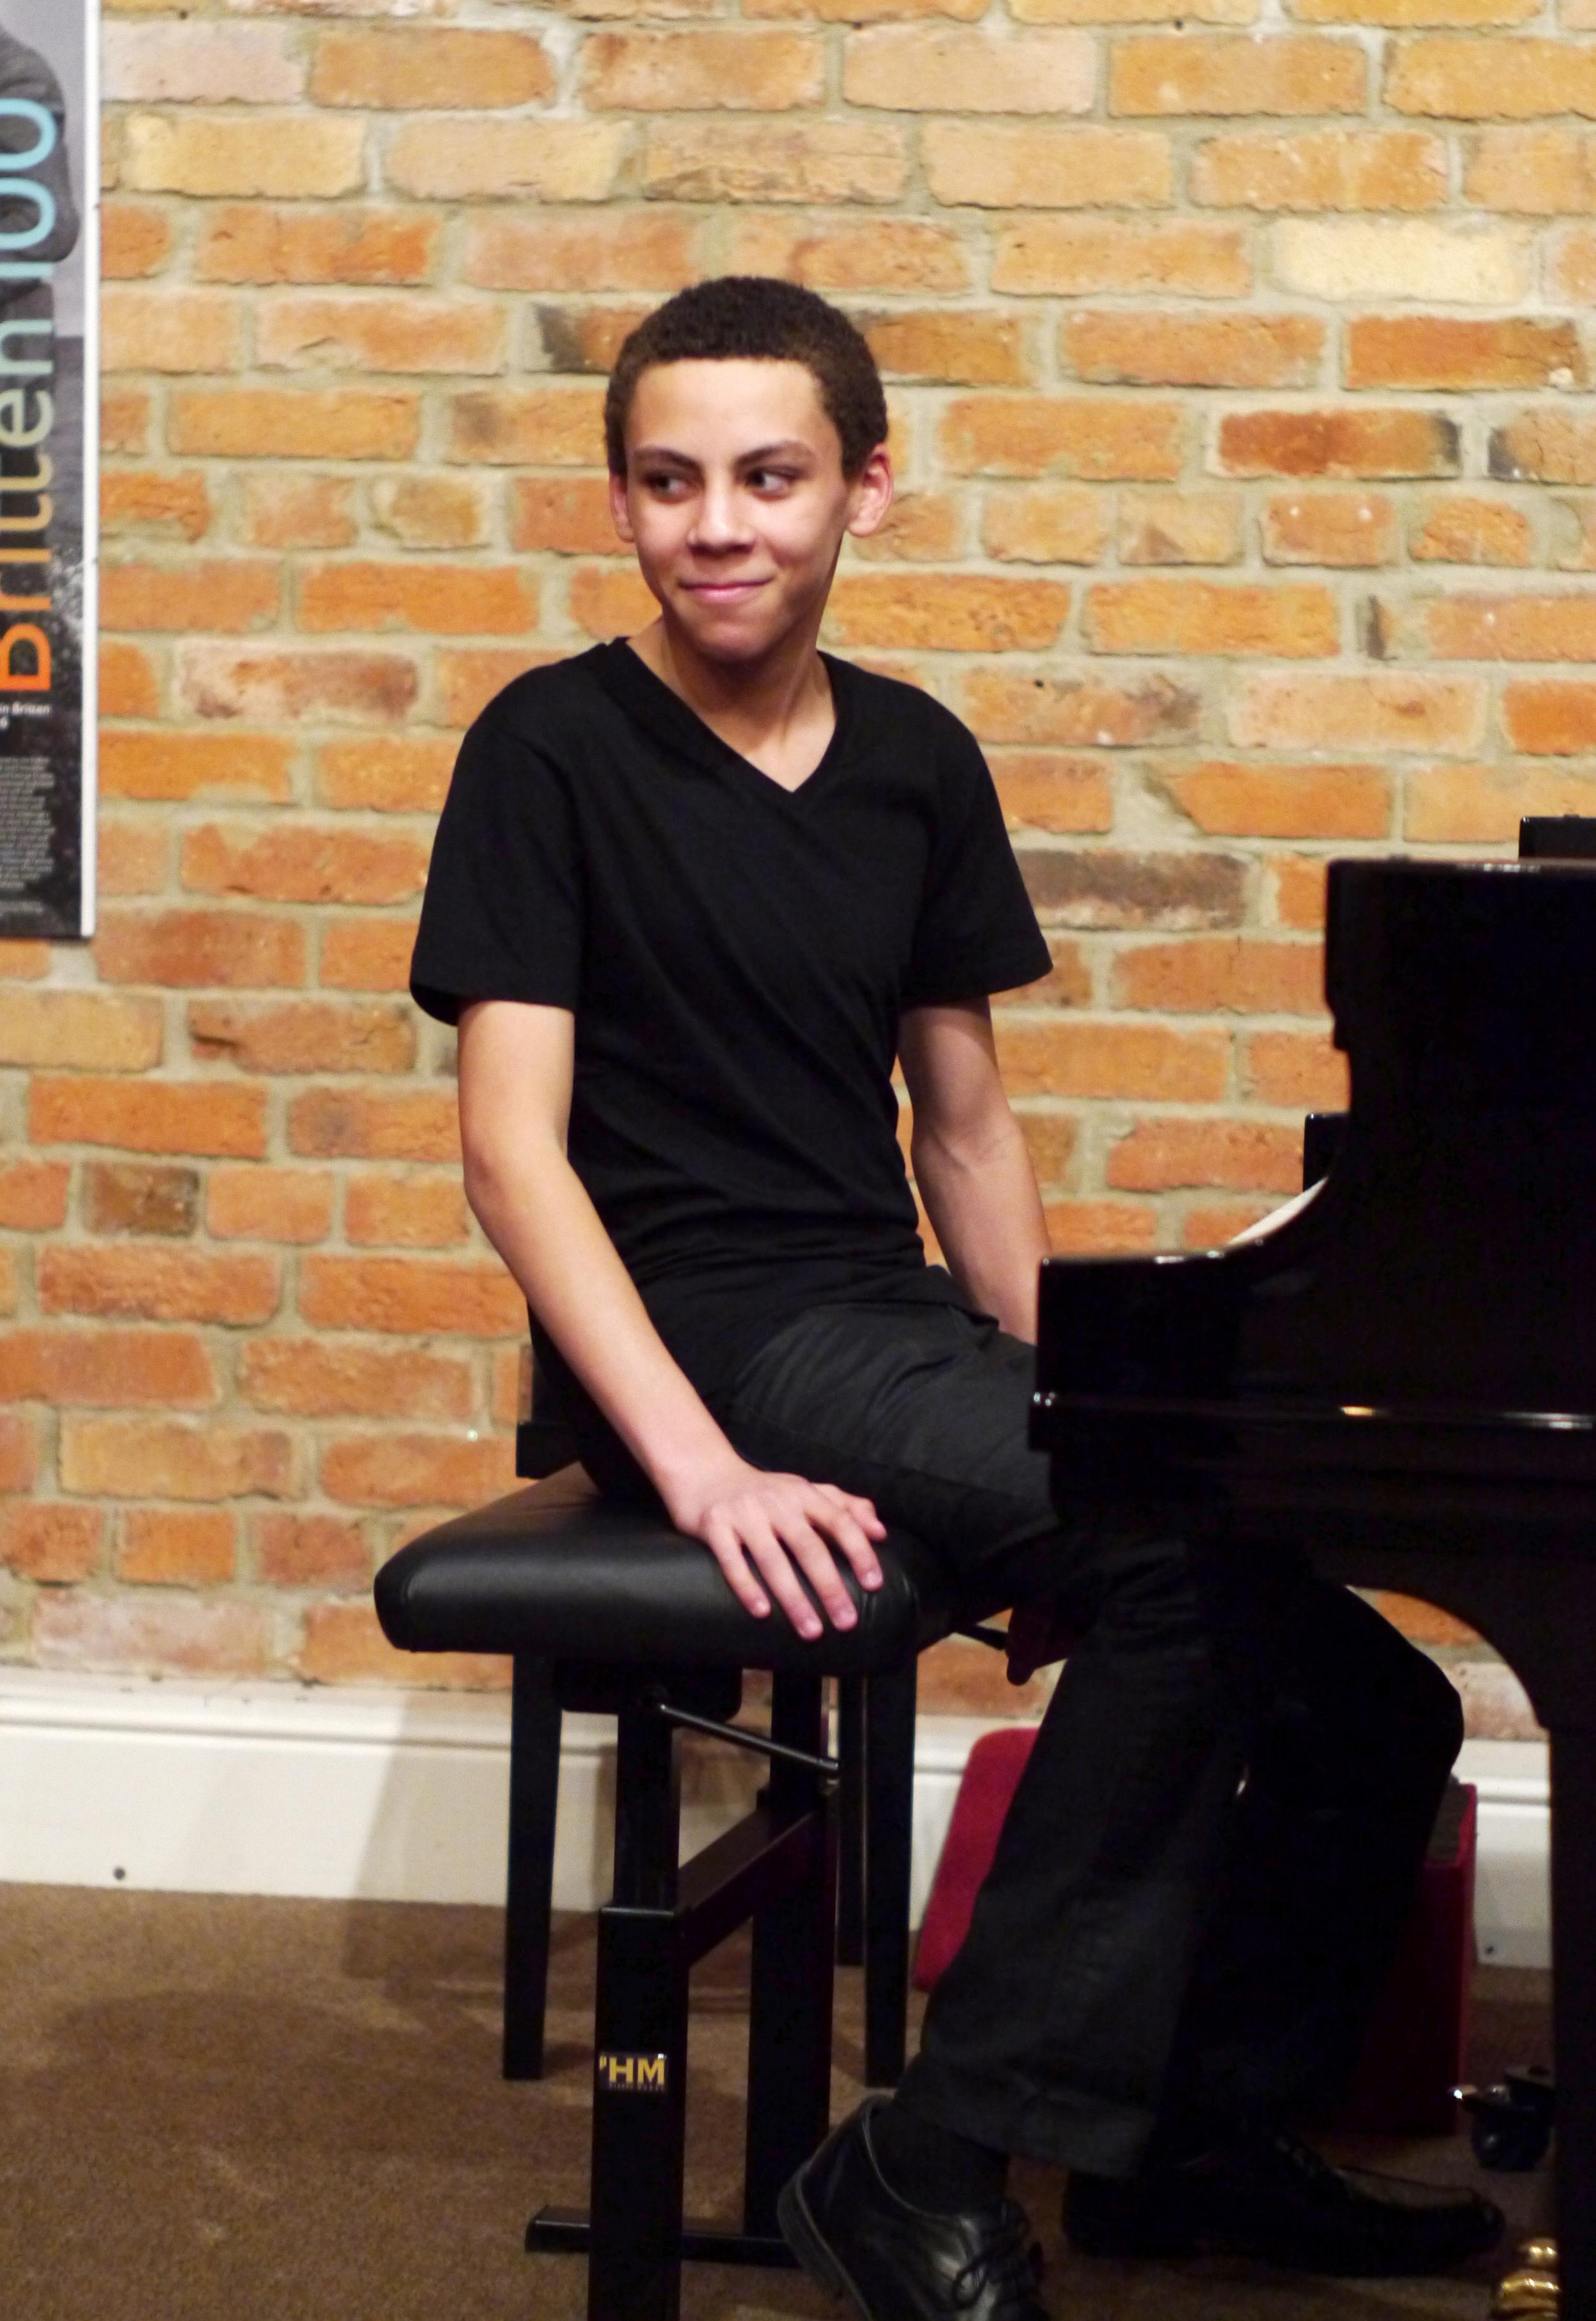 Smiley Daniel.JPG